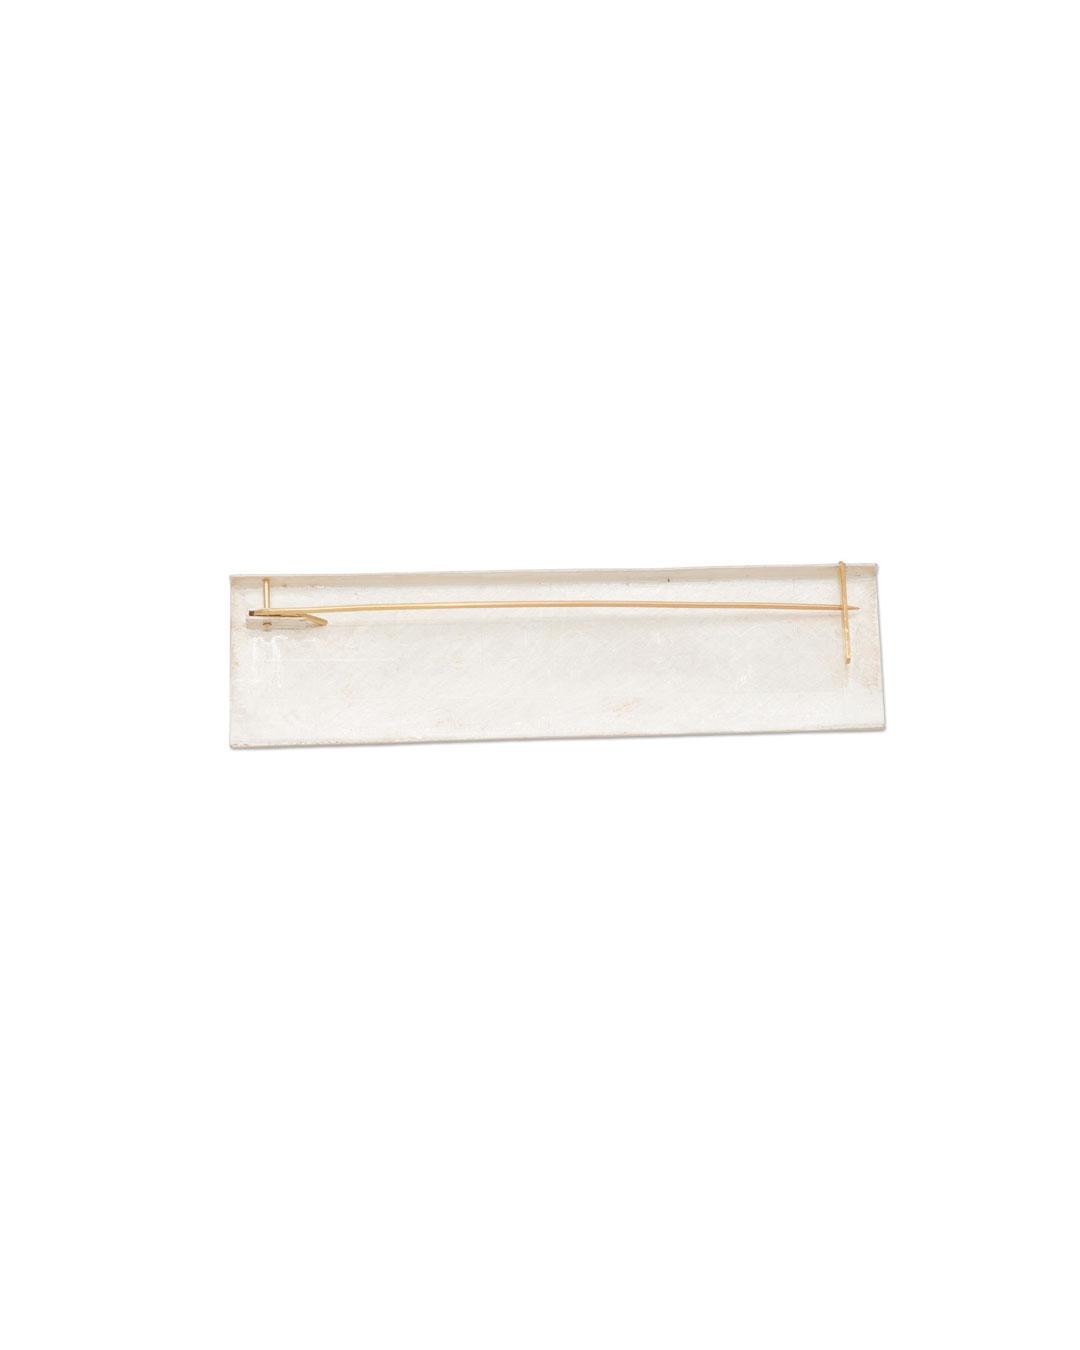 Noam Elyashiv, Reduce, 2017, brooch; reclaimed silver, 18ct gold, 50 x 22 x 6 mm, €1350